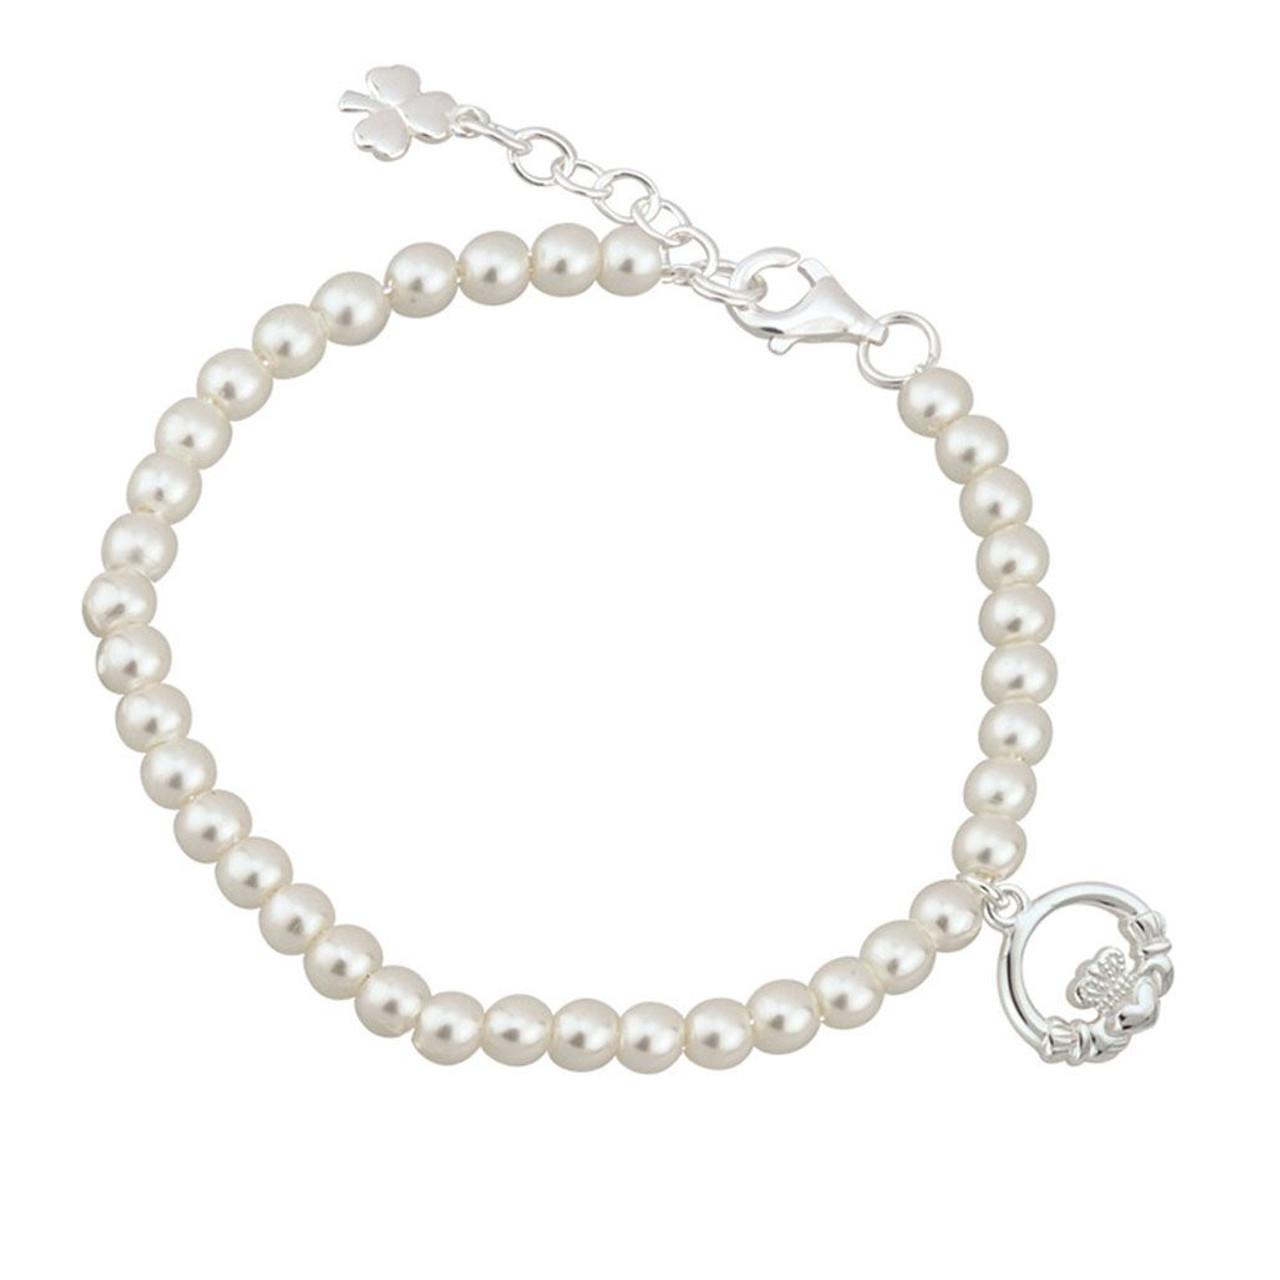 Child's Communion Claddagh Bracelet w/Glass Pearls